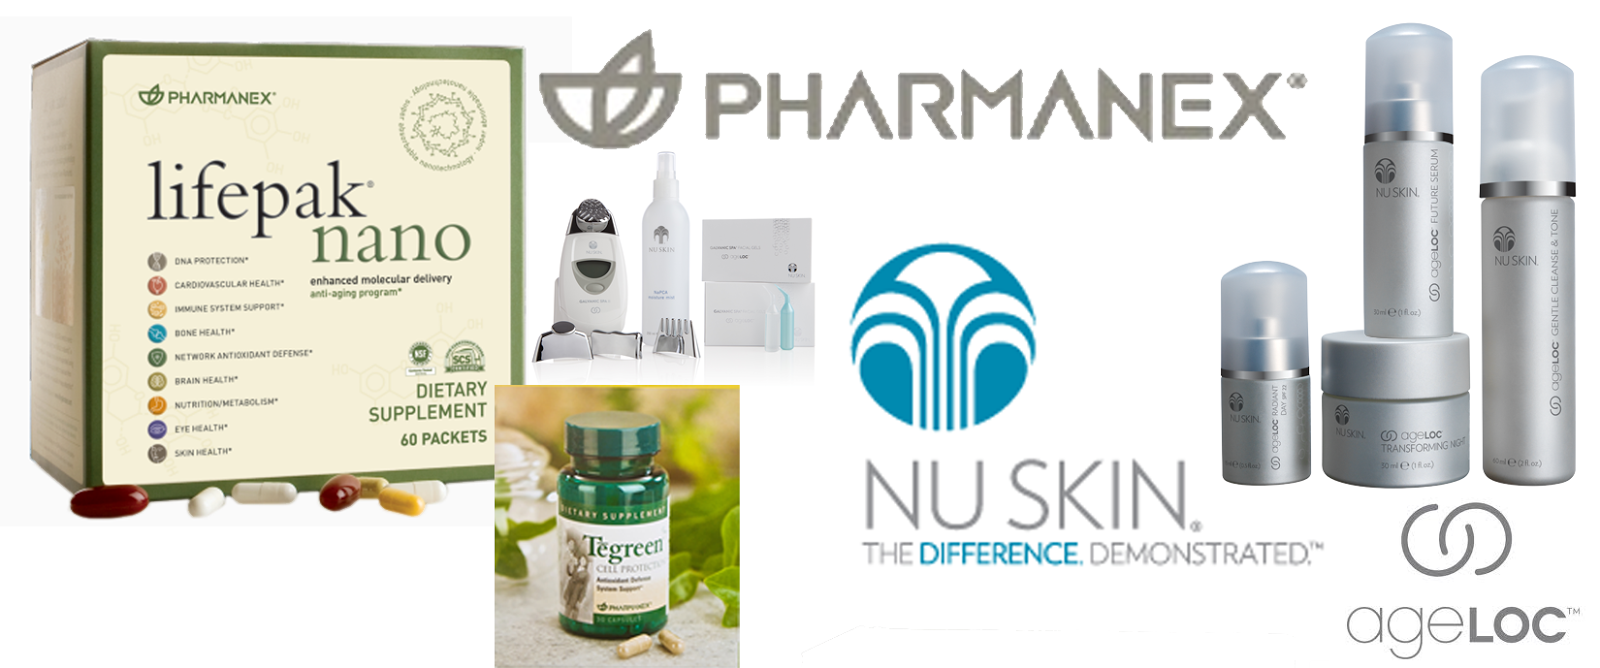 Nuskin (Pharmanex)